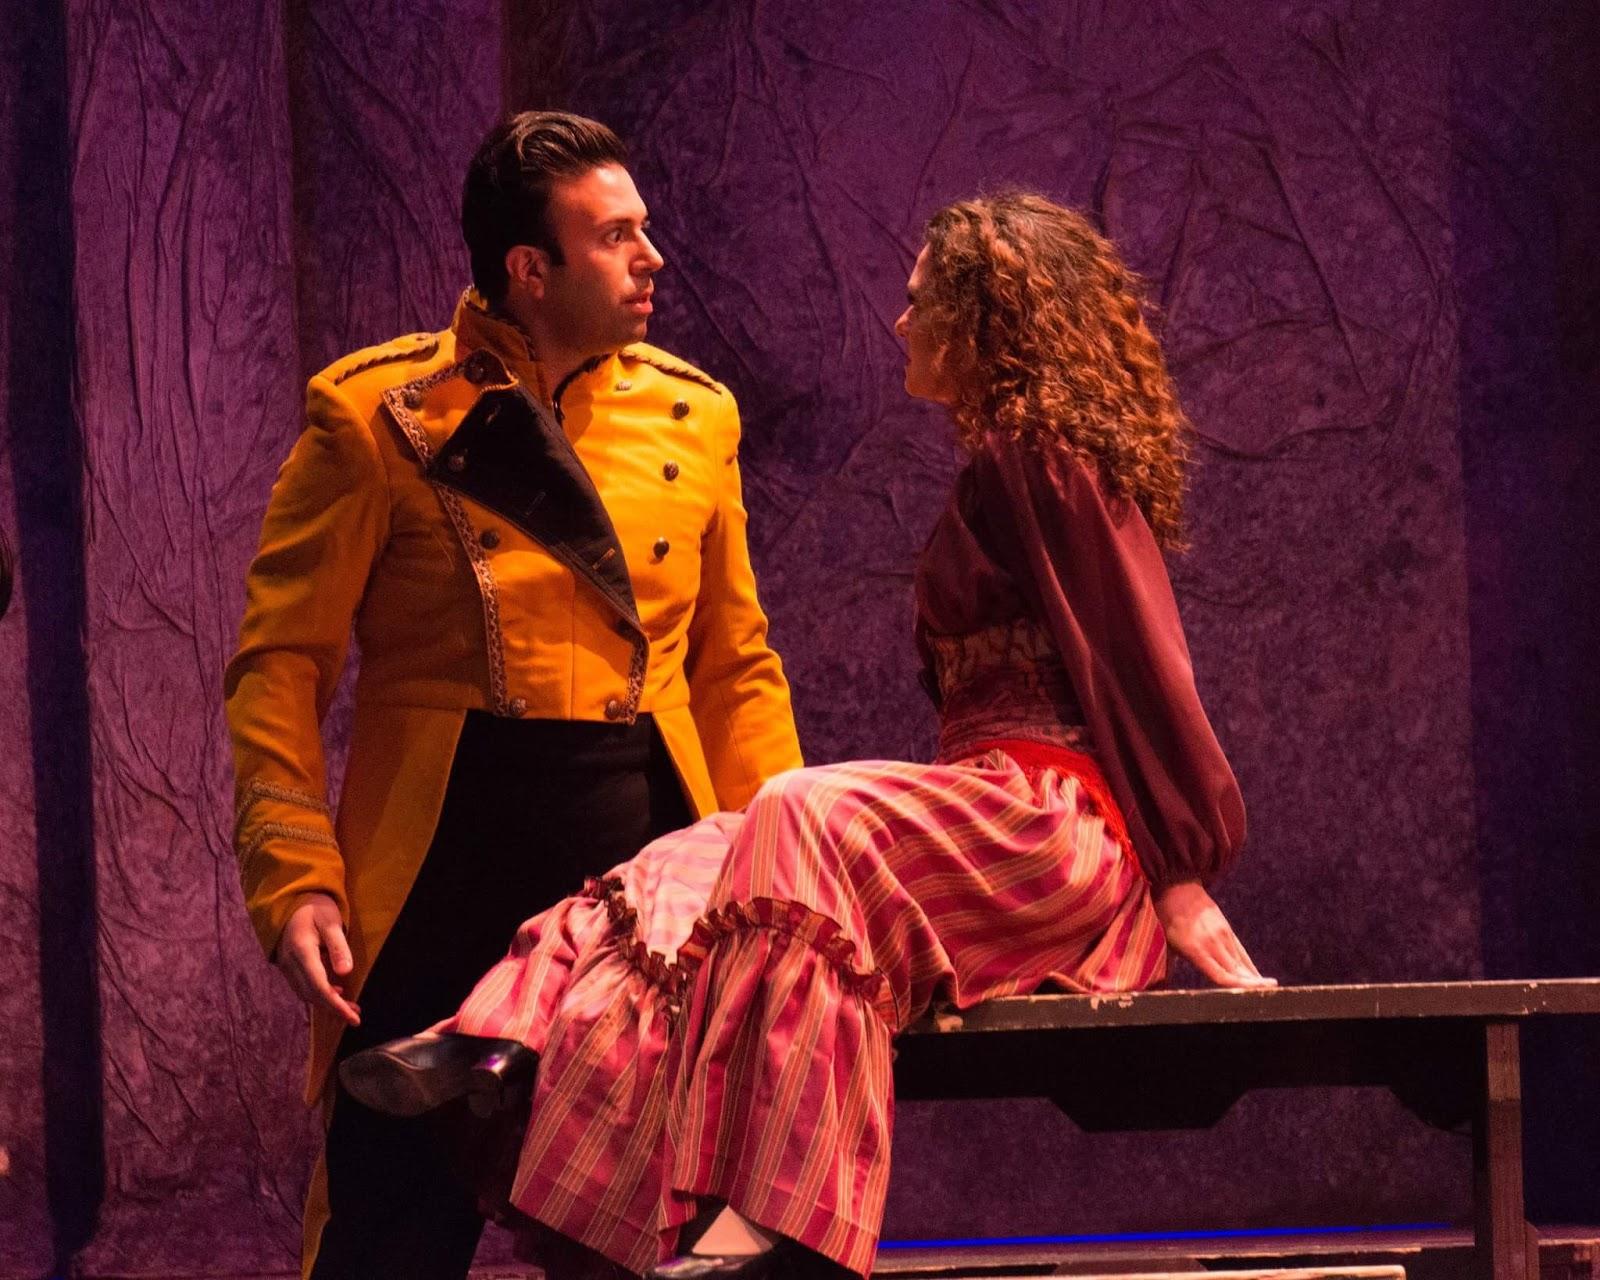 IN PERFORMANCE: Mezzo-soprano SANDRA PIQUES EDDY as Carmen (right) and tenor DINYAR VANIA as Don José (left) in Greensboro Opera's production of Georges Bizet's CARMEN, January 2017 [Photo © by Greensboro Opera]